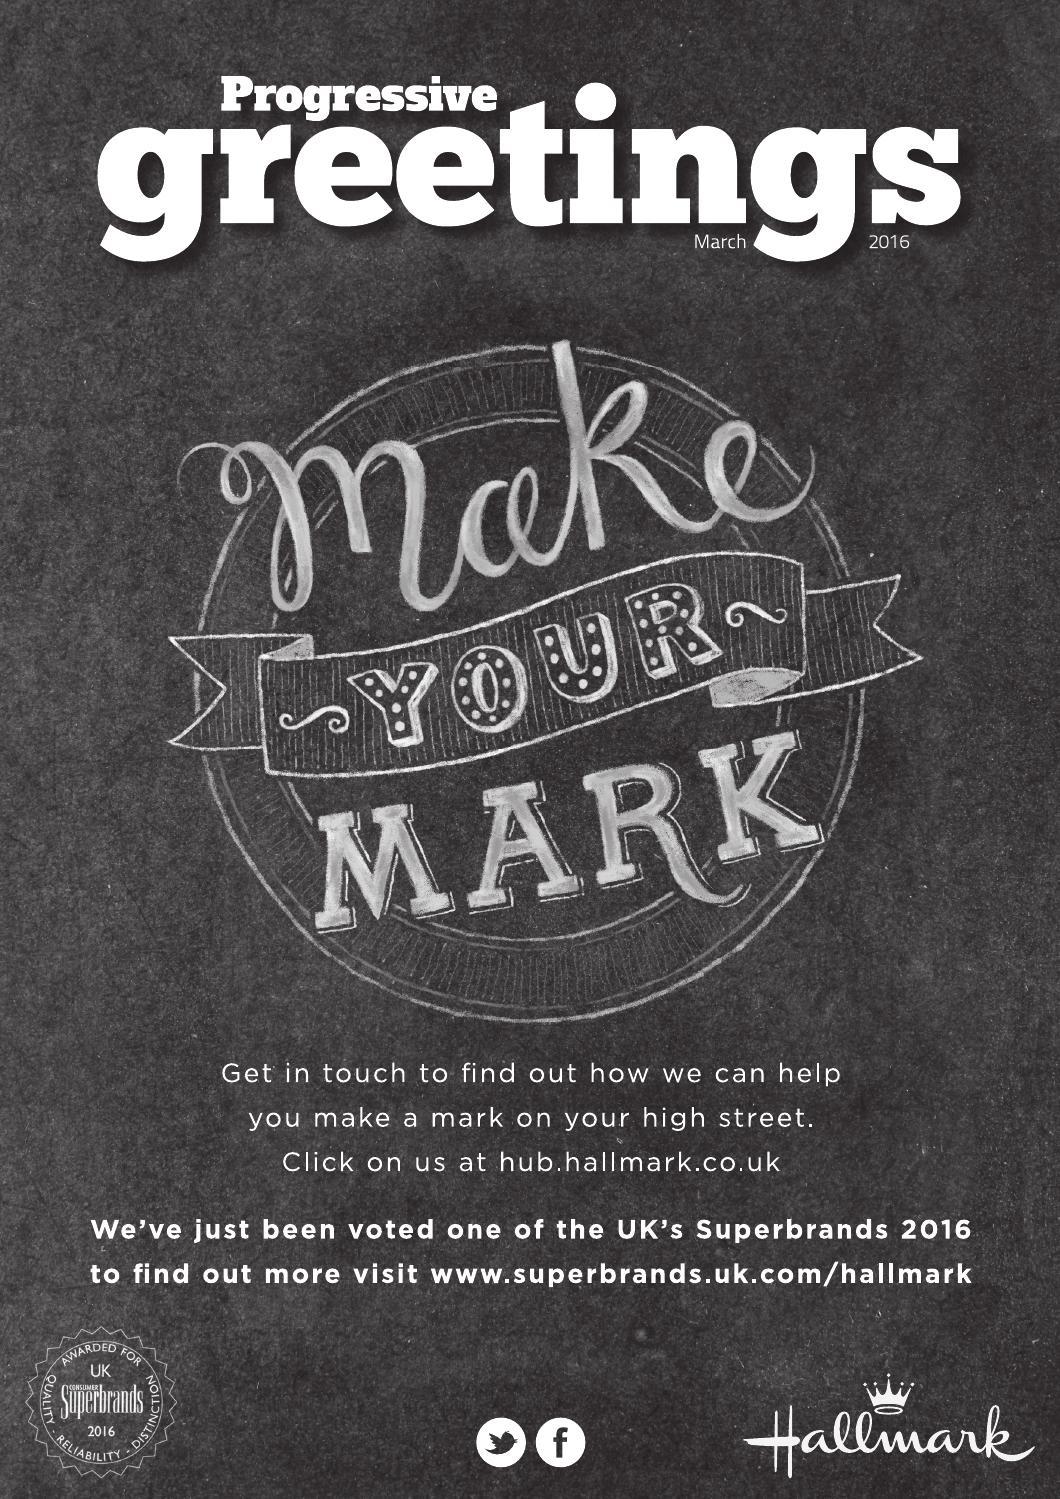 Progressive greetings worldwide february 2017 by max publishing issuu kristyandbryce Choice Image